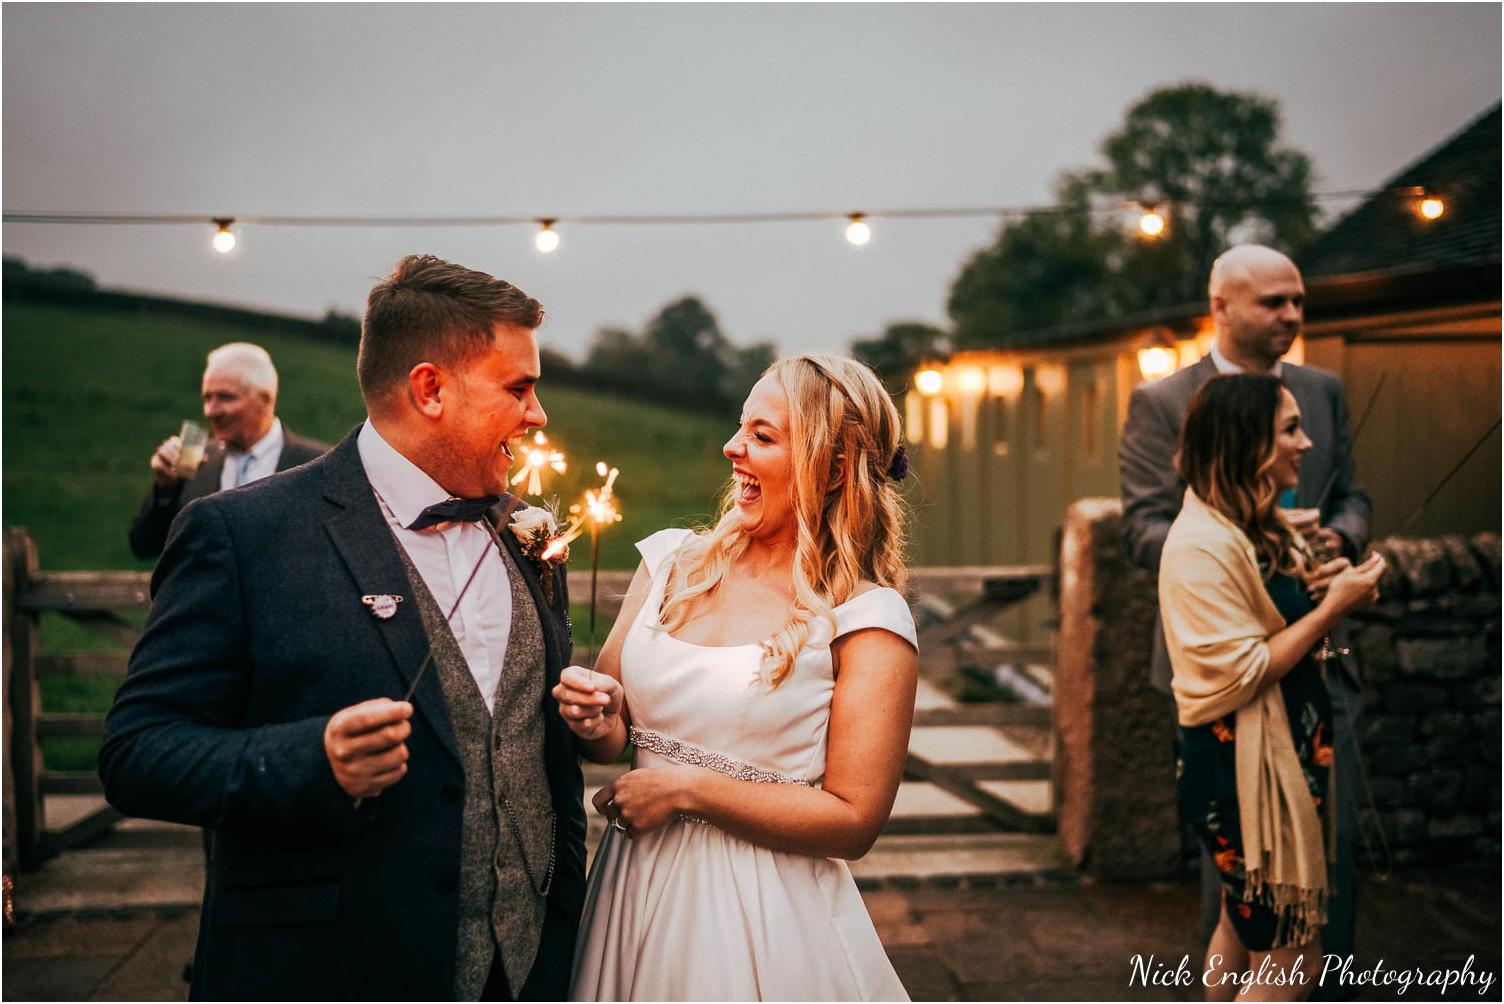 The_Ashes_Barn_Endon_Stoke_Wedding_Photographer-142.jpg